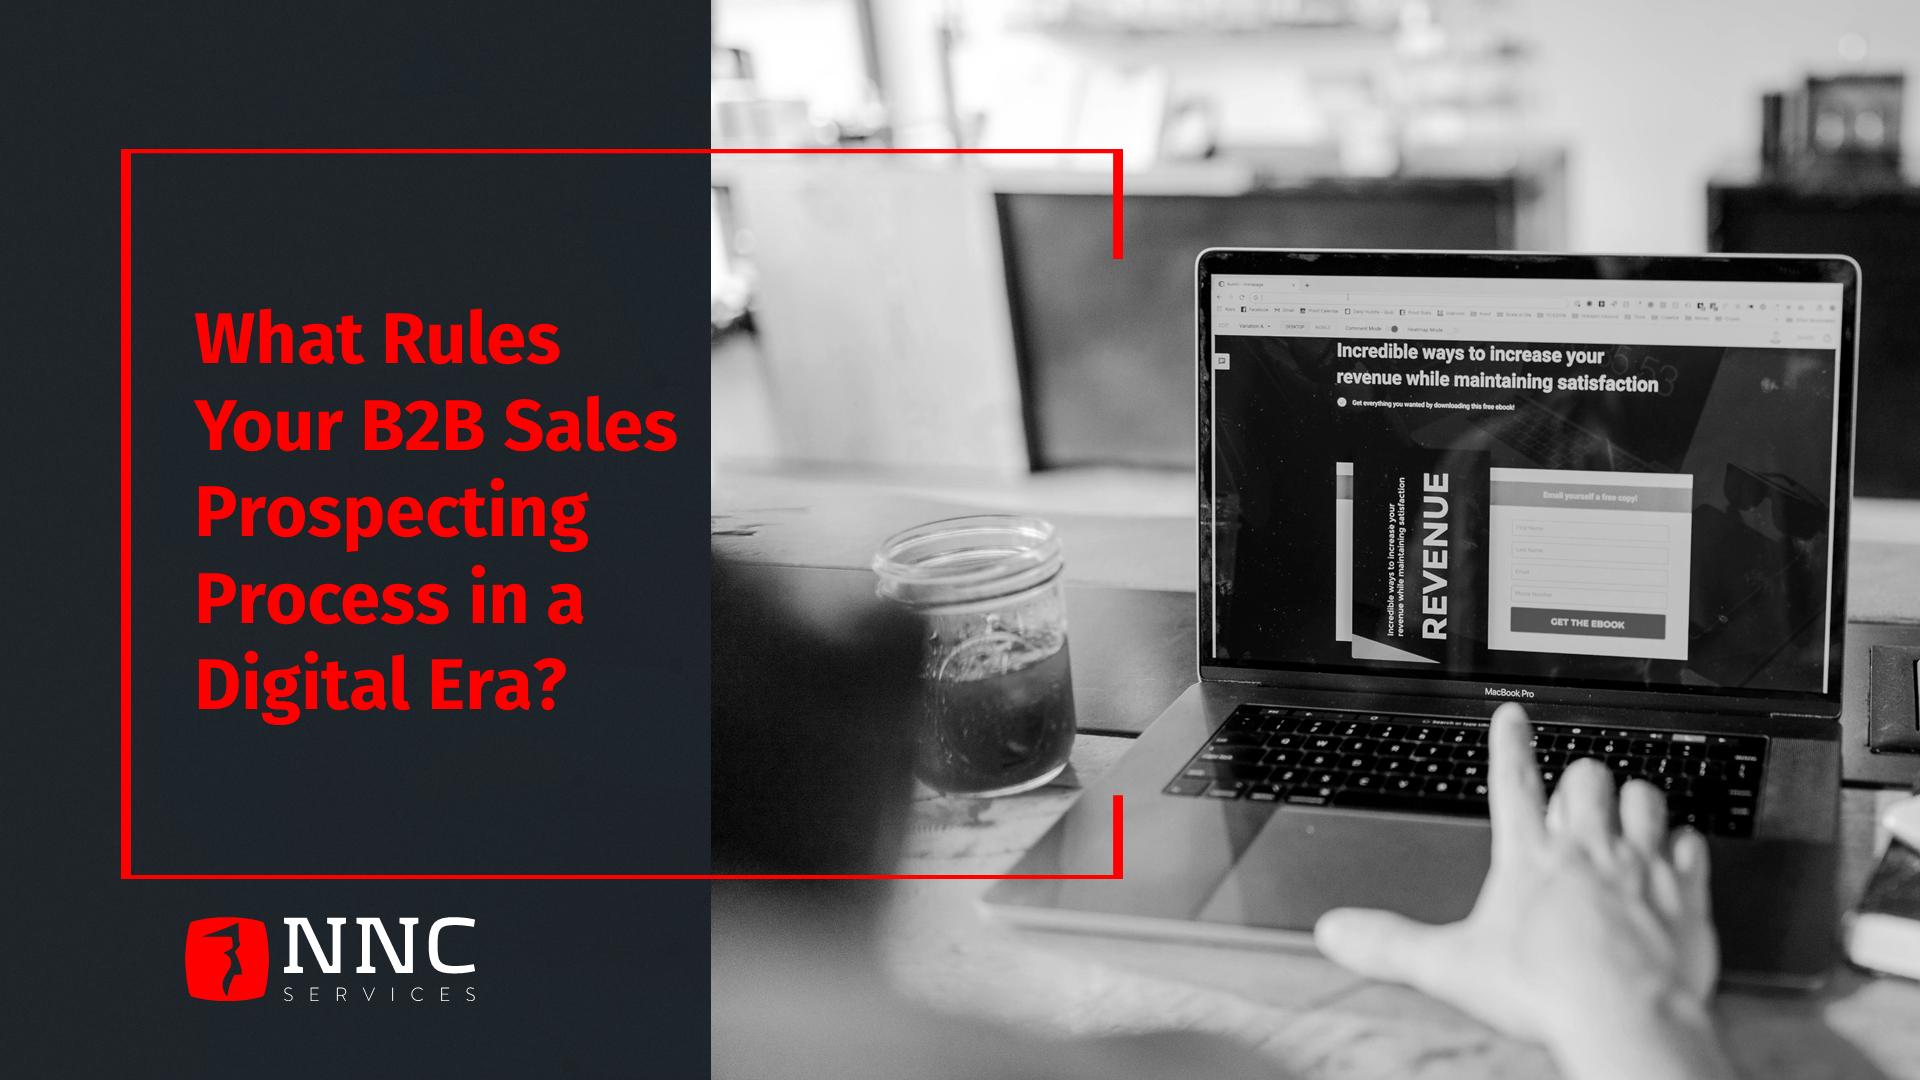 NNC Services B2B Sales Prospecting Process